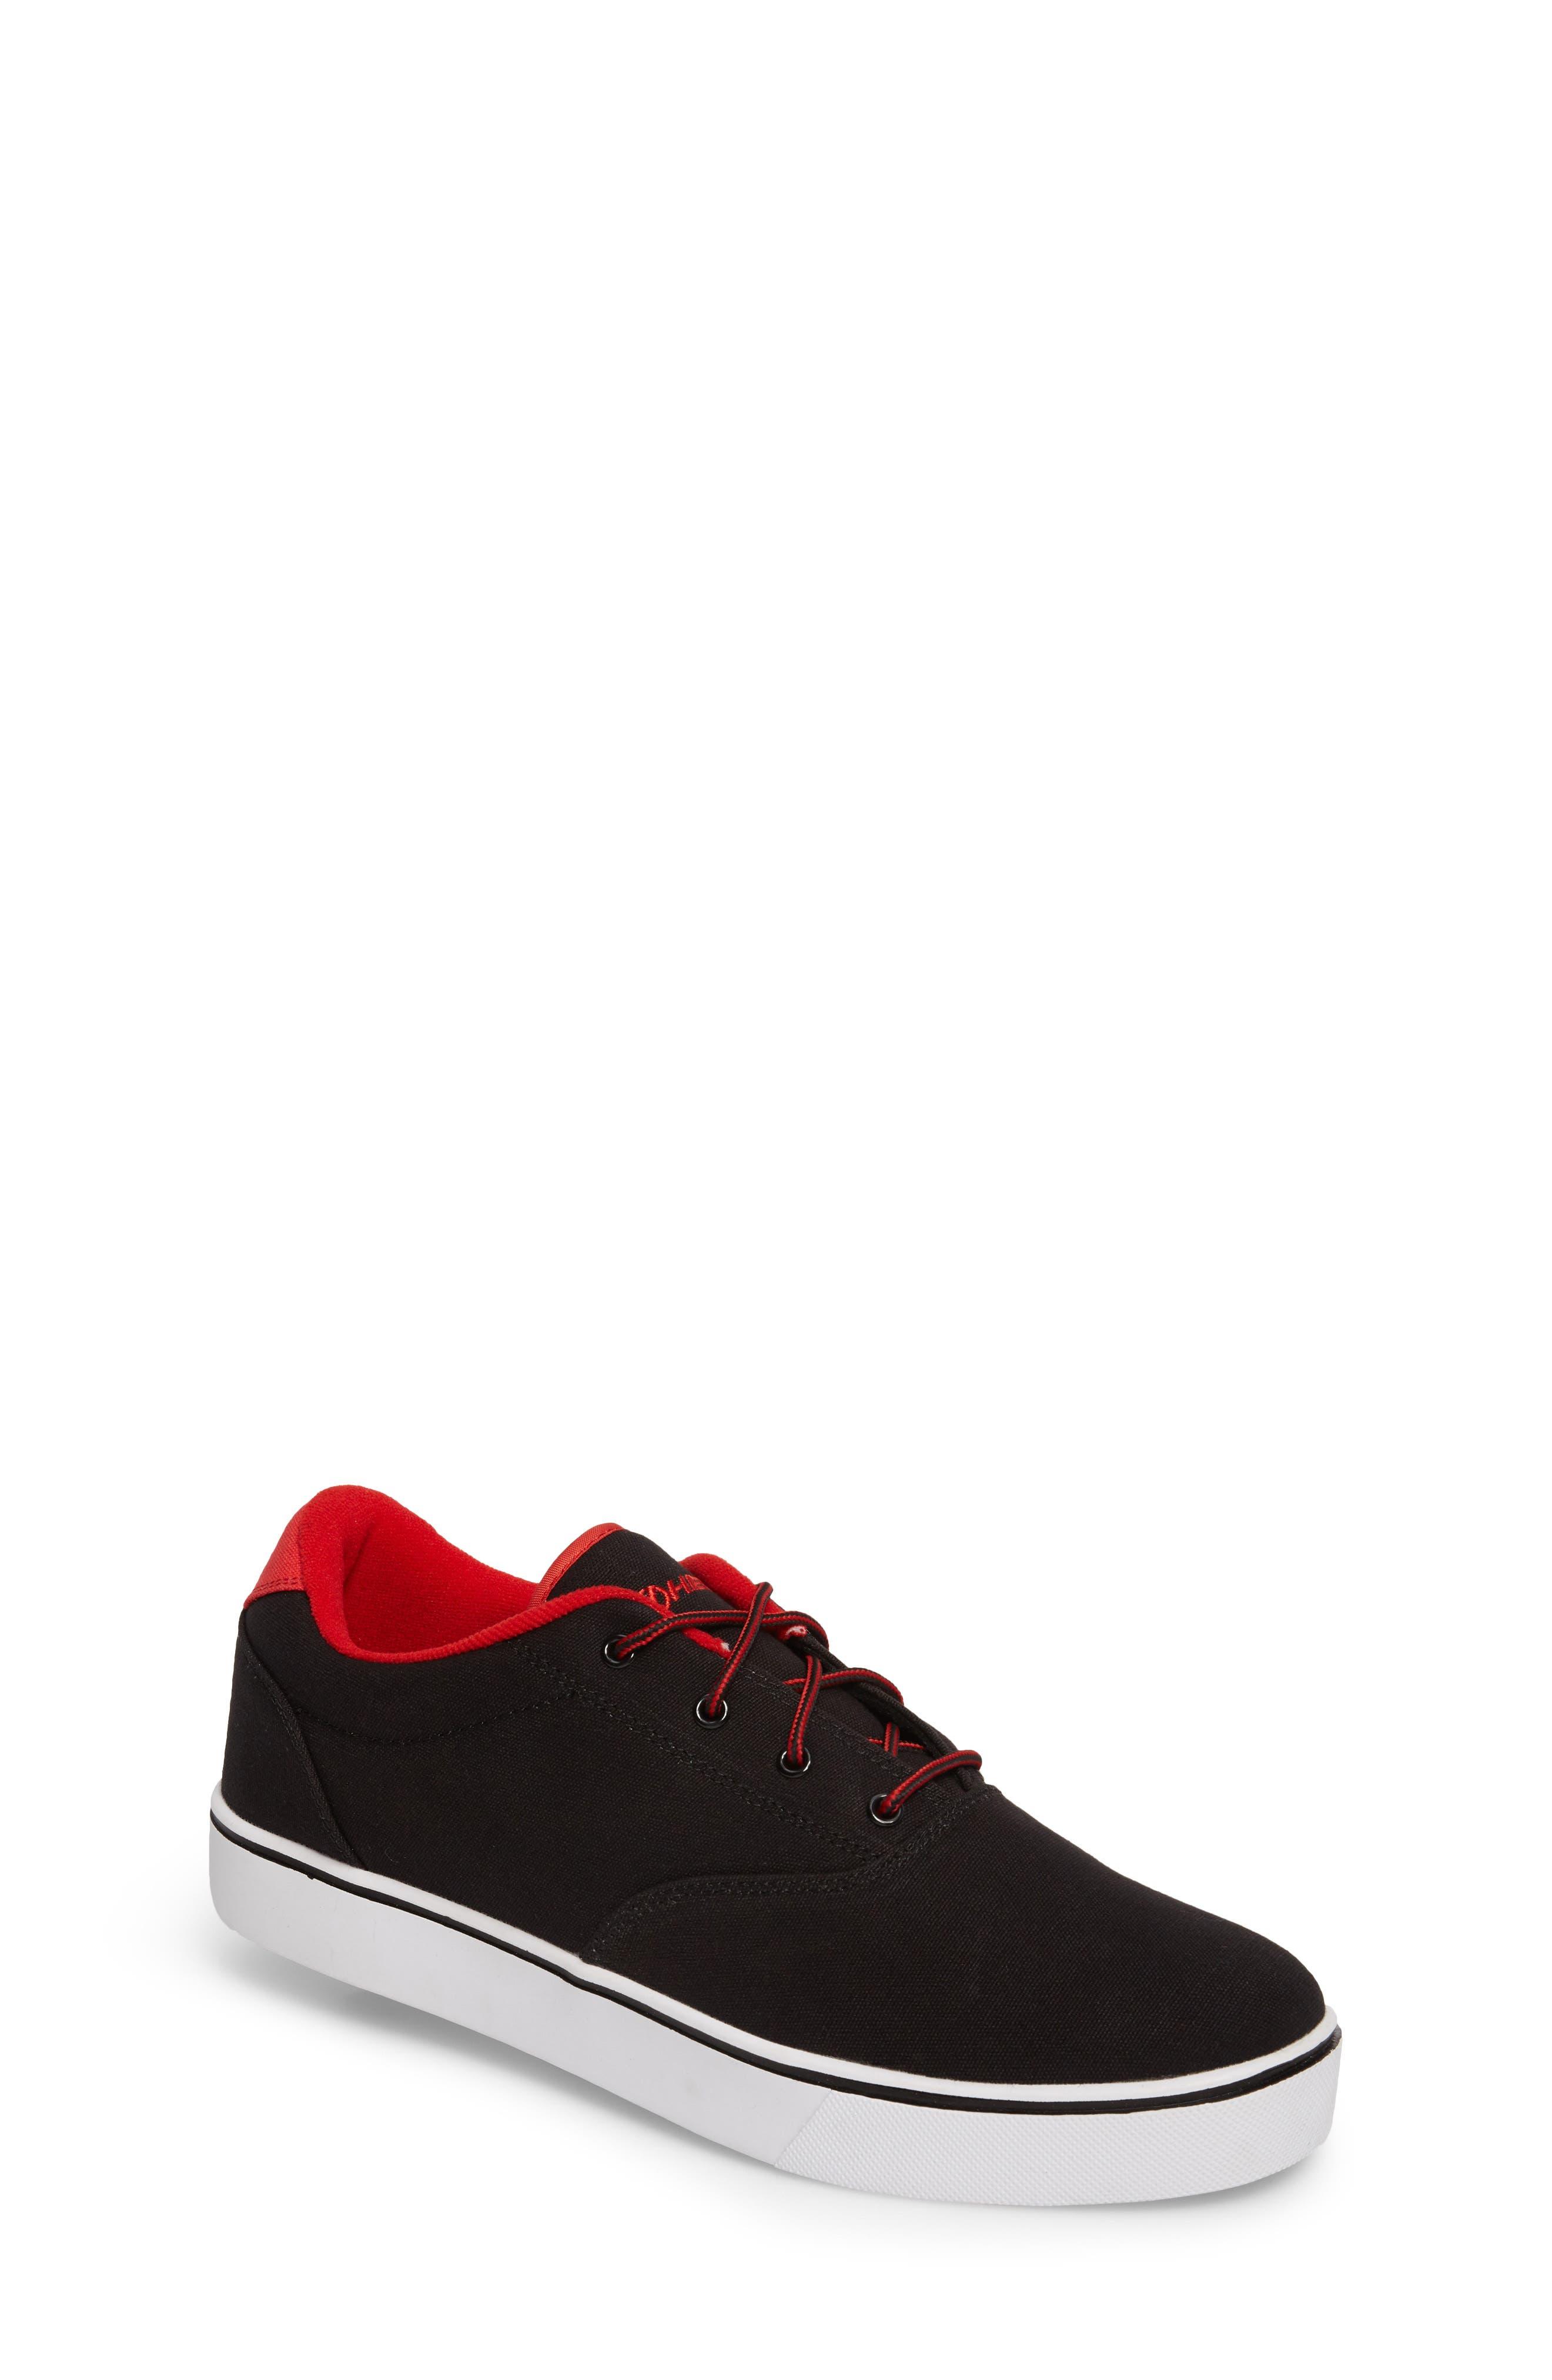 'Launch' Skate Sneaker,                             Main thumbnail 1, color,                             006